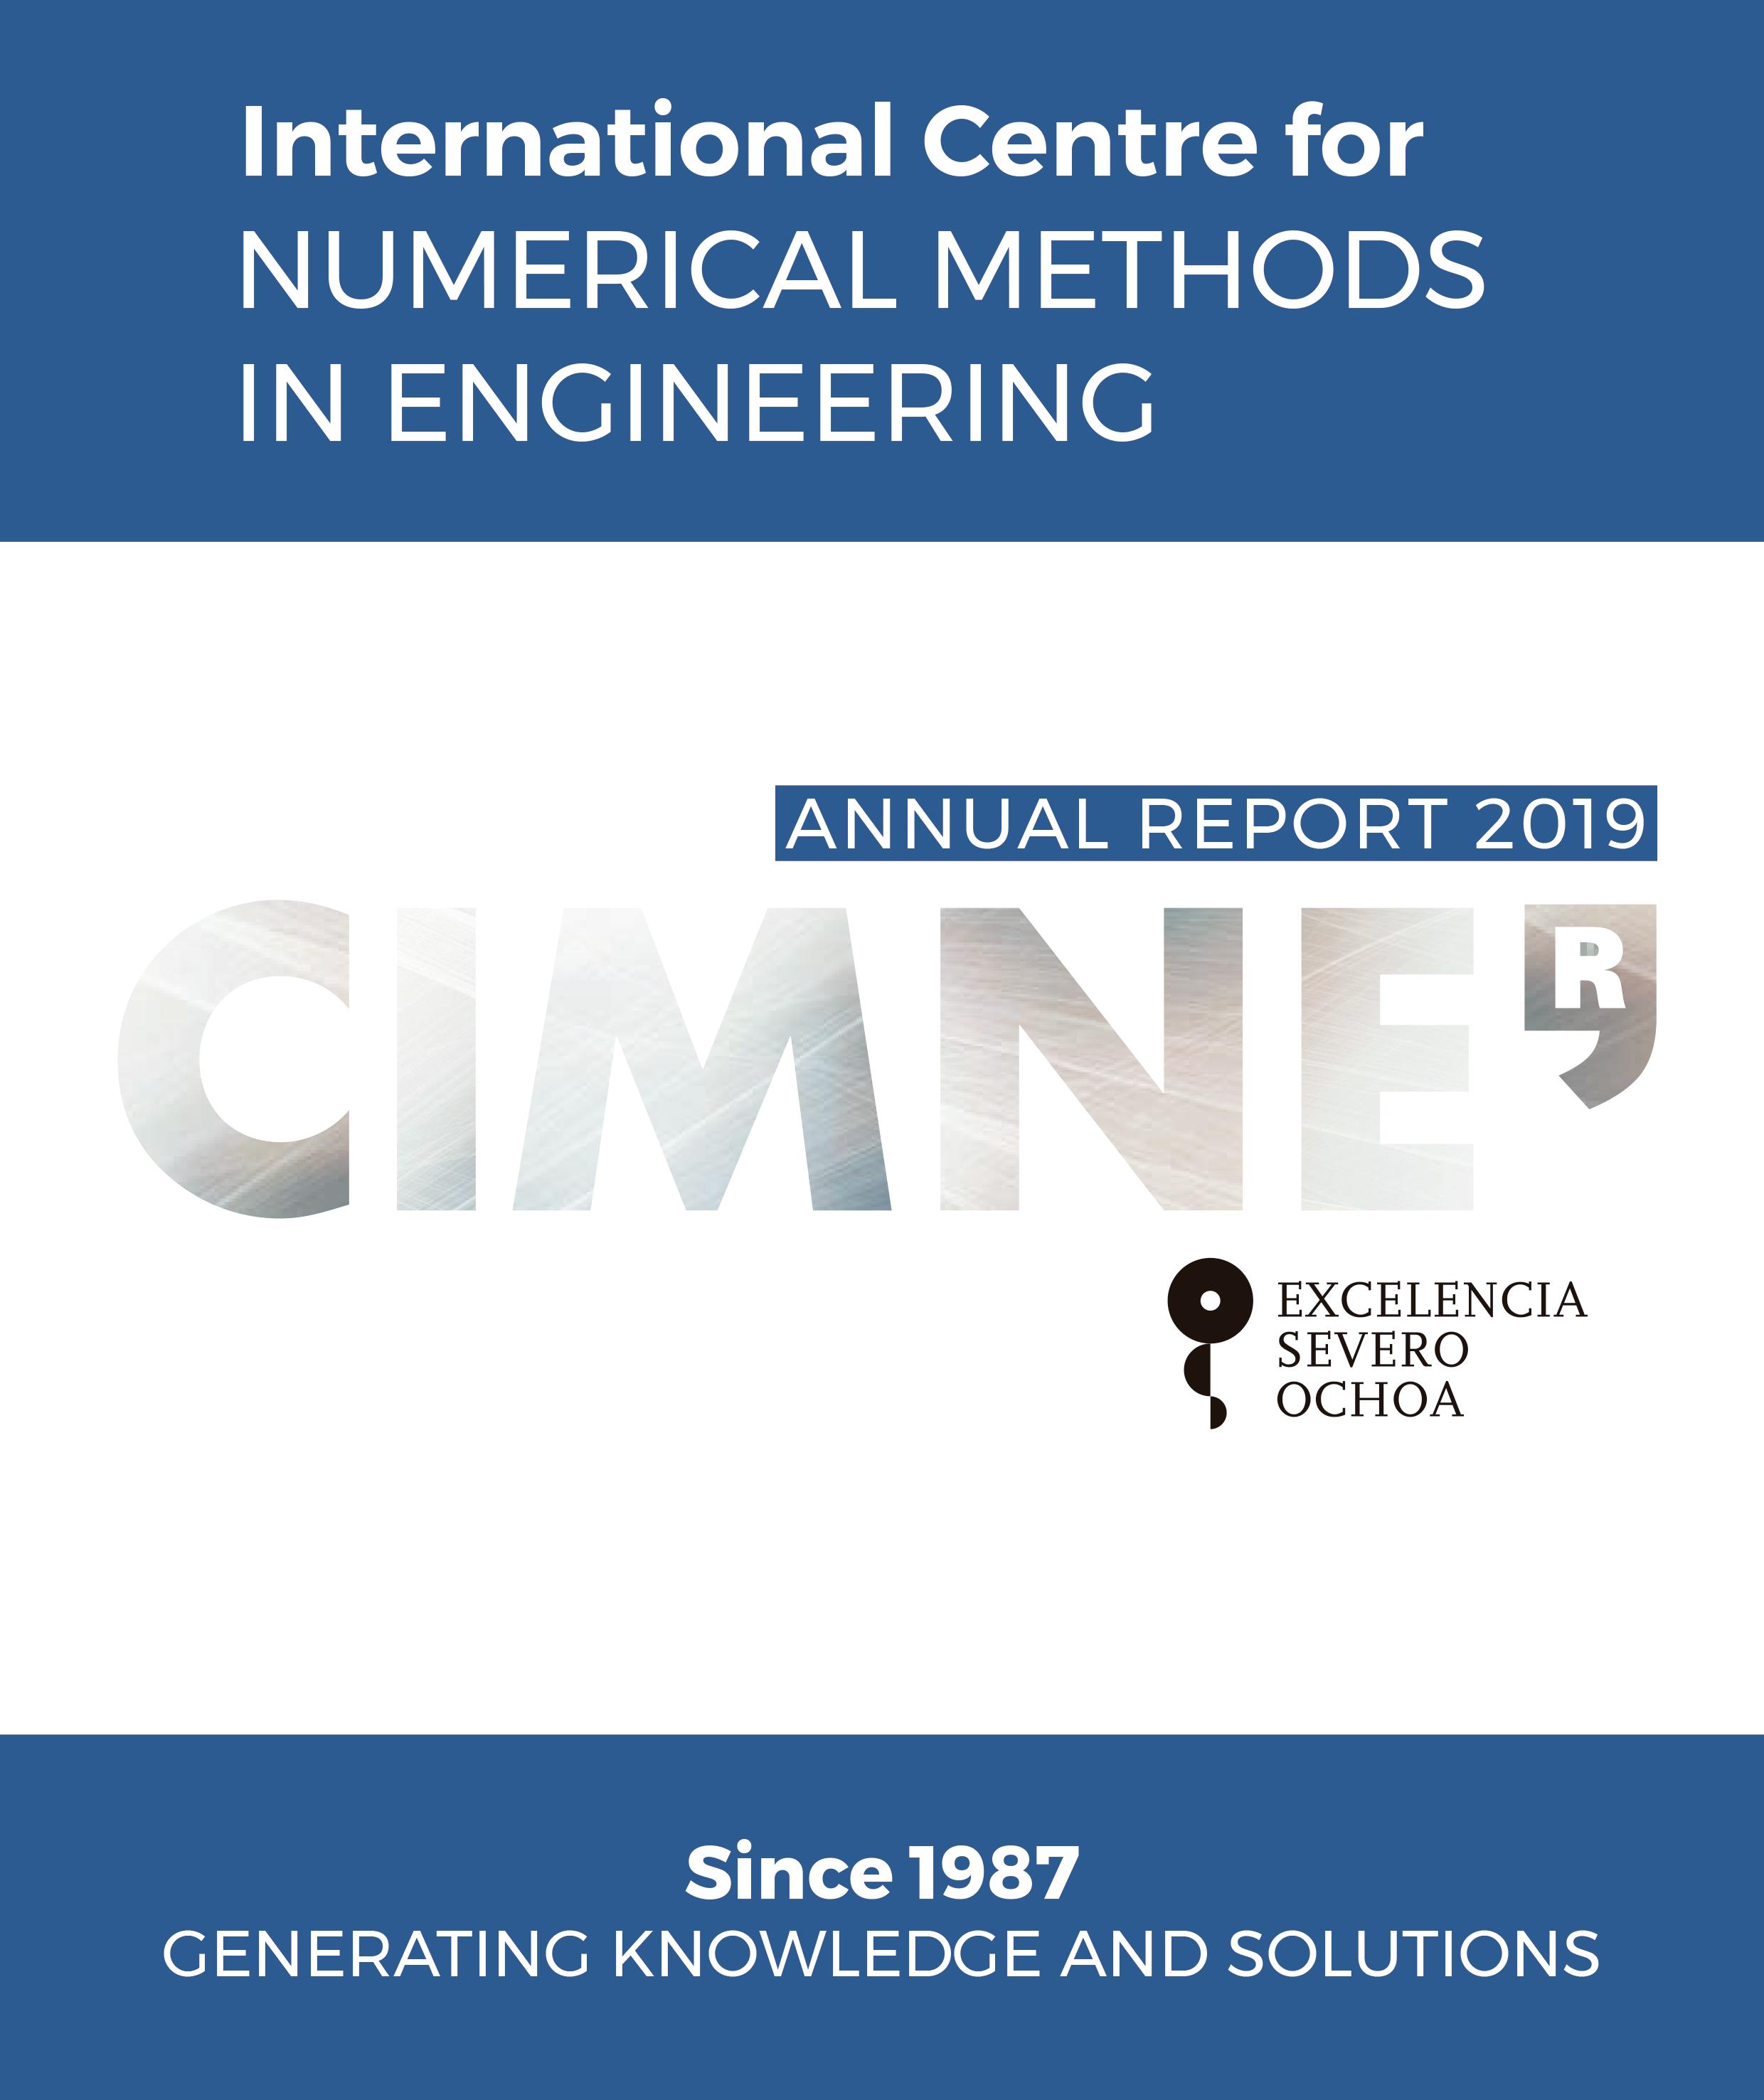 CIMNE Annual Report Cover